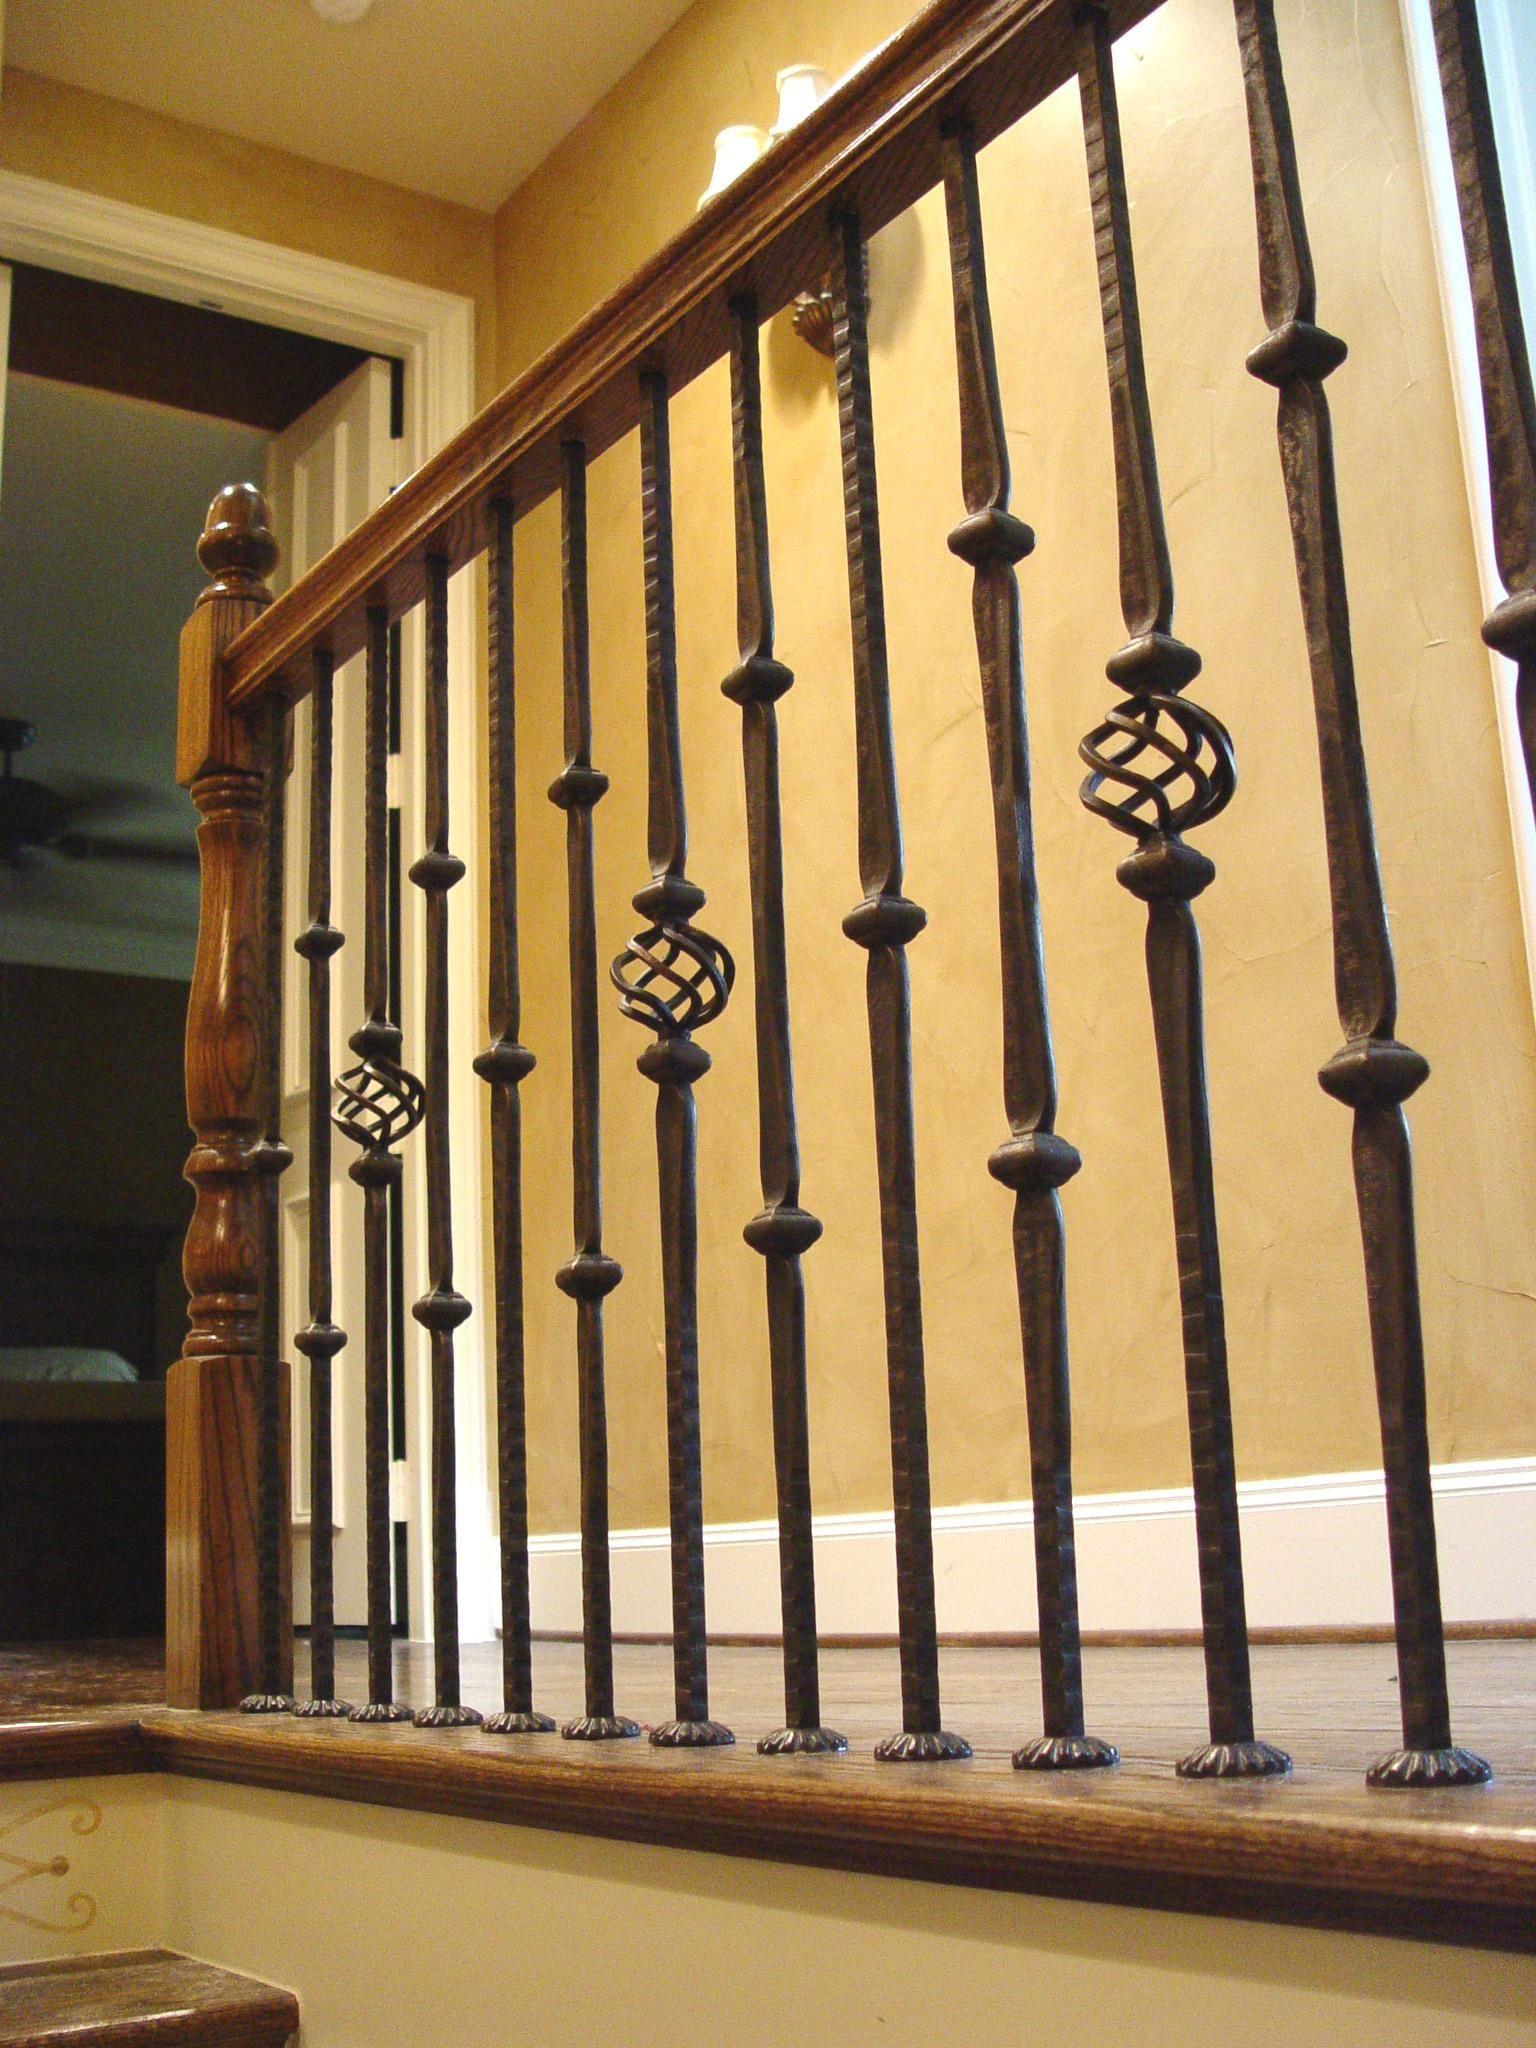 Iron Balusters Patterns Stair Railing Design Wrought Iron